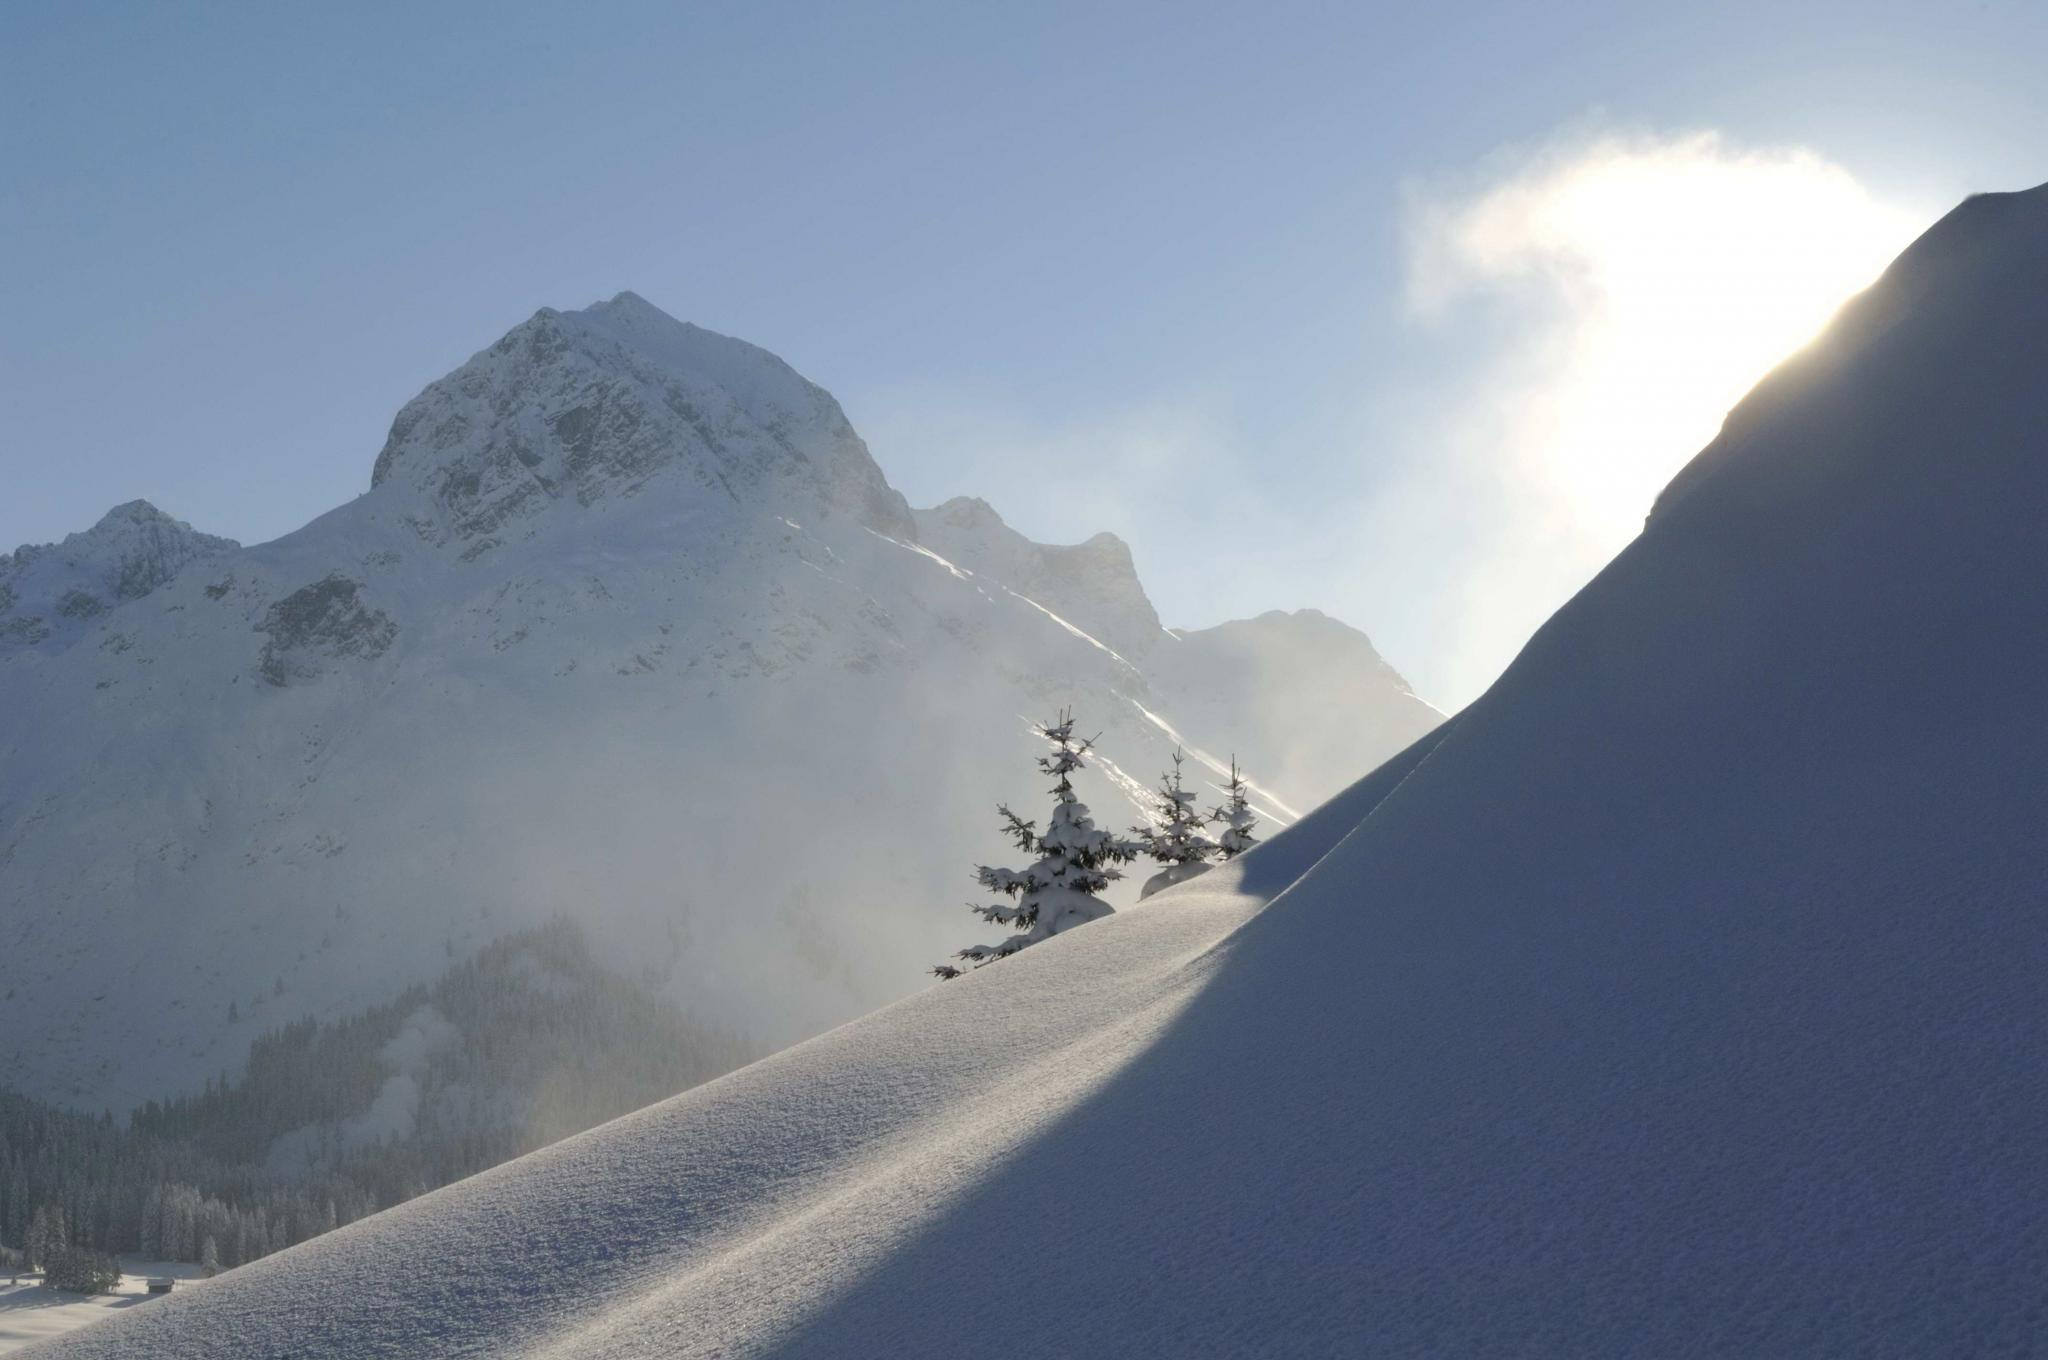 Berge Schnee Ausblick